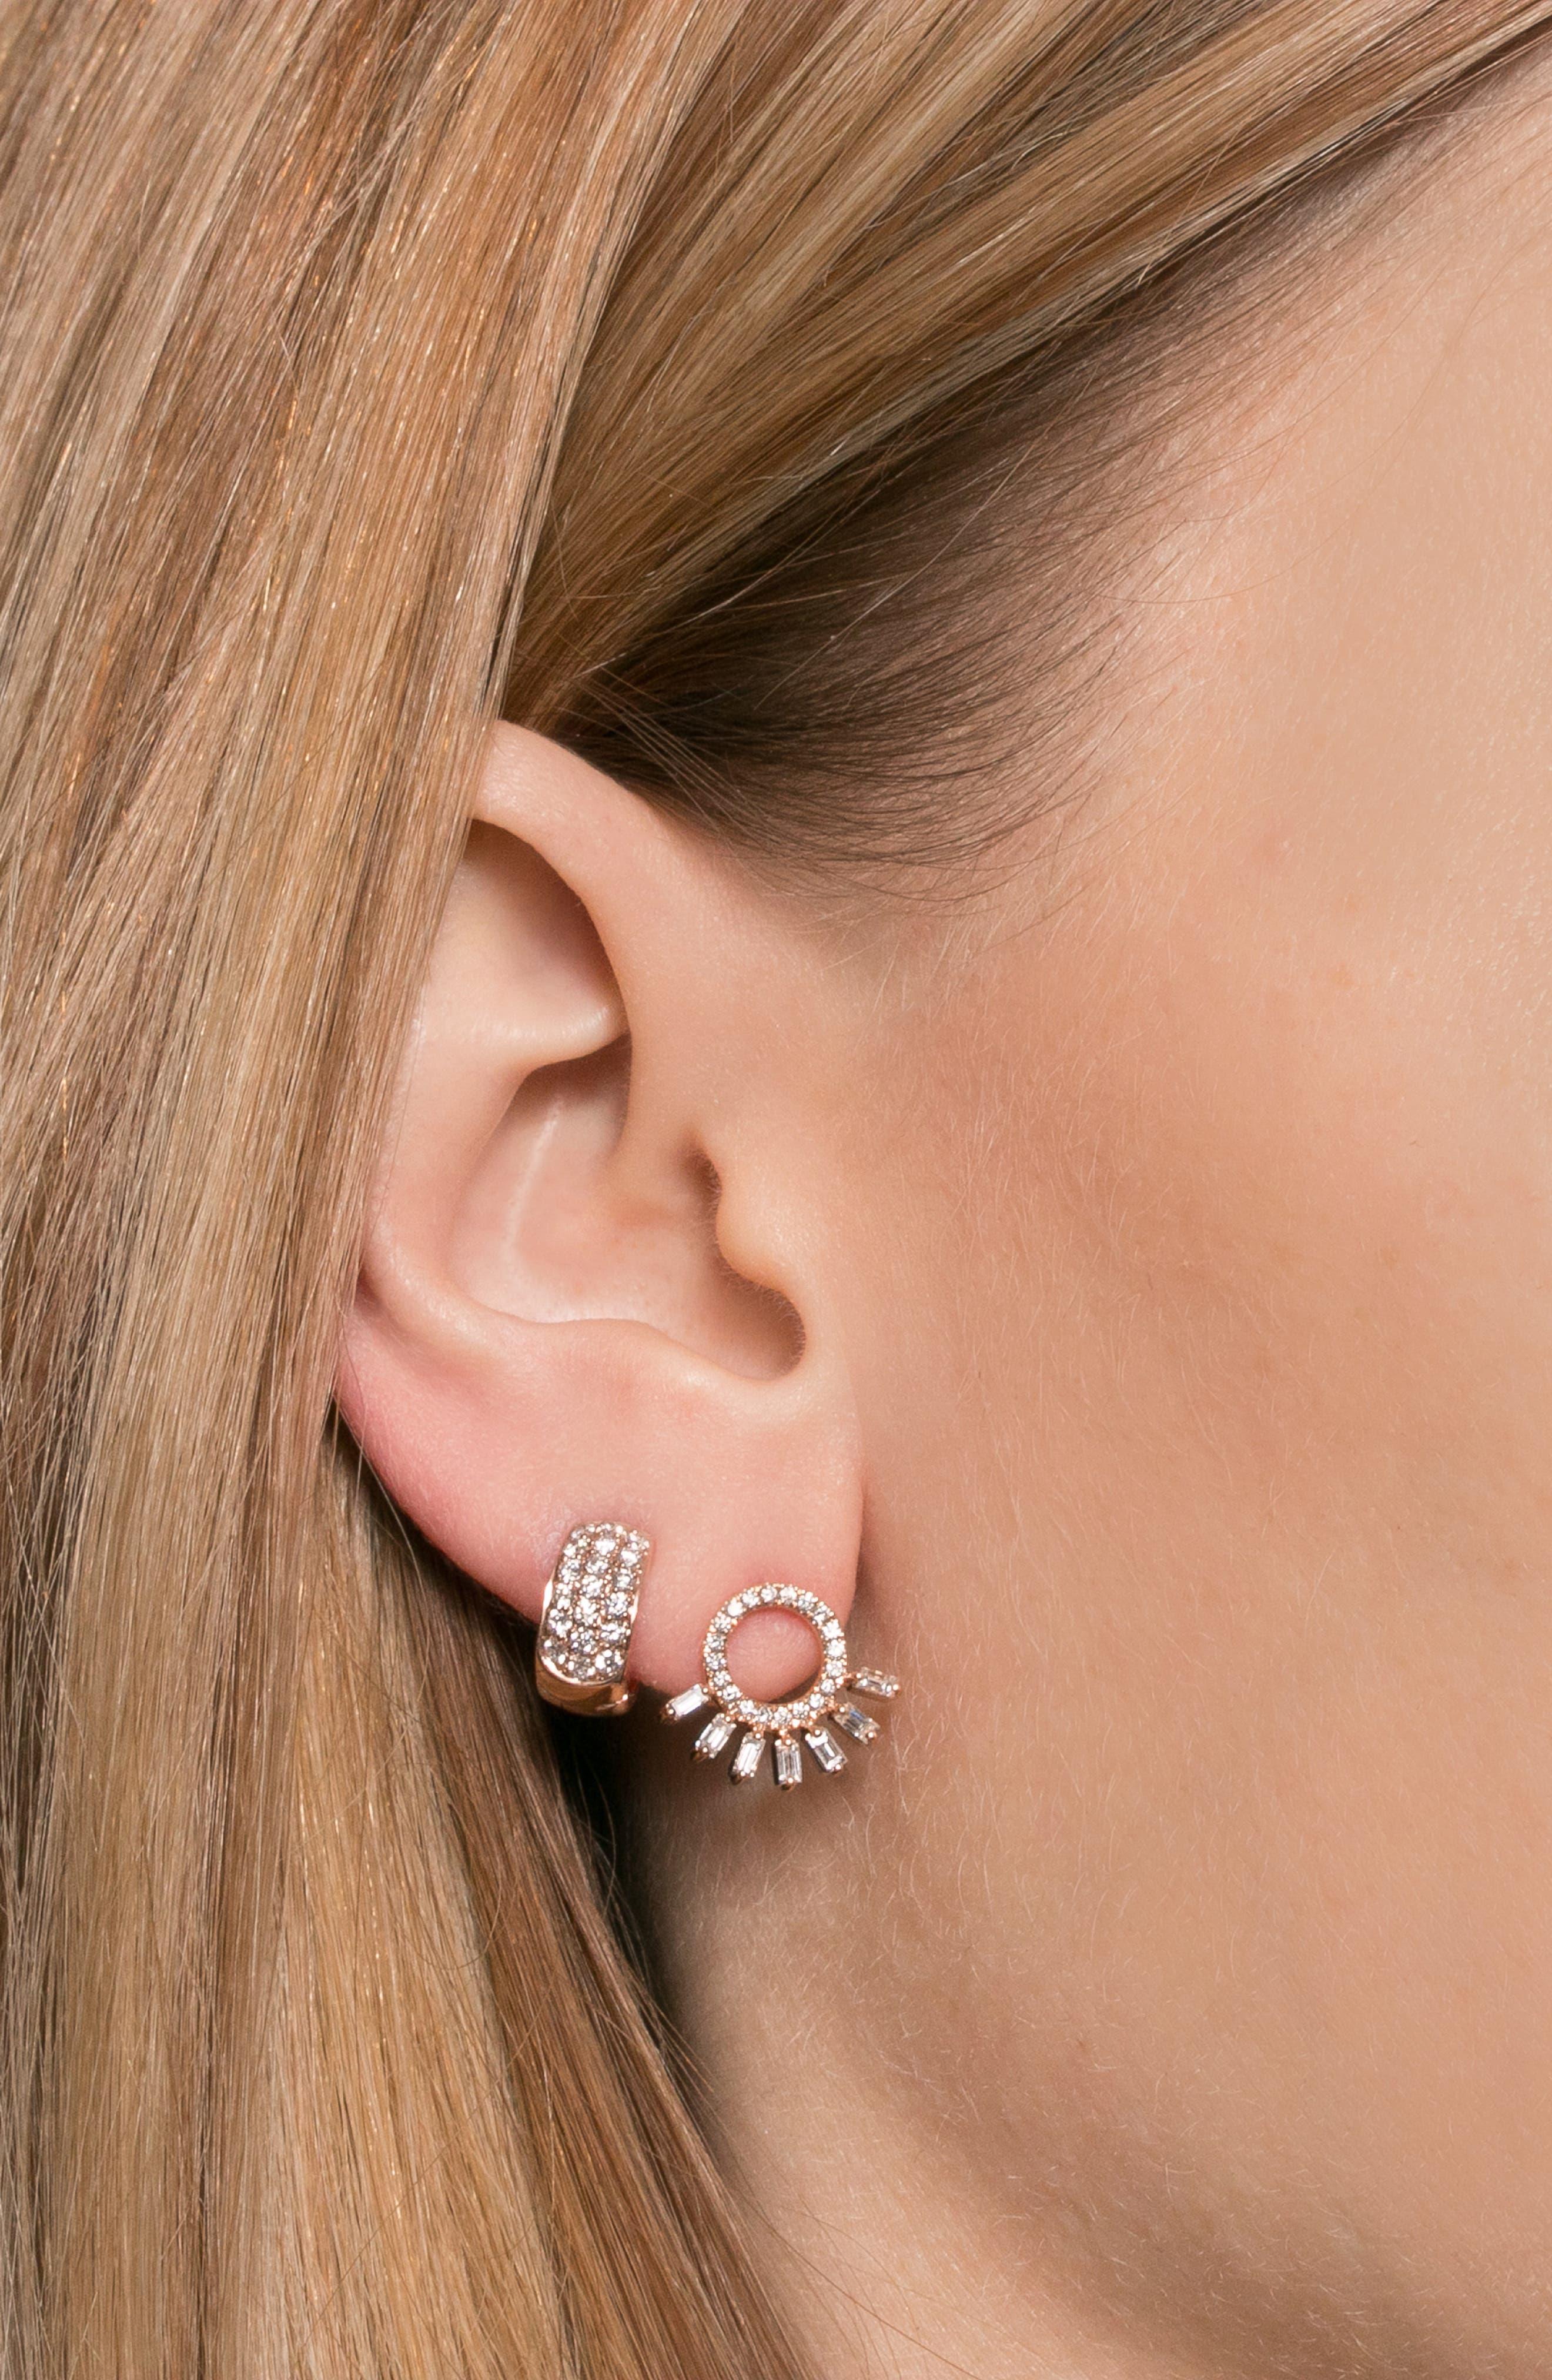 Dana Rebecca Mini Diamond Hoop Earrings,                             Alternate thumbnail 4, color,                             YELLOW GOLD